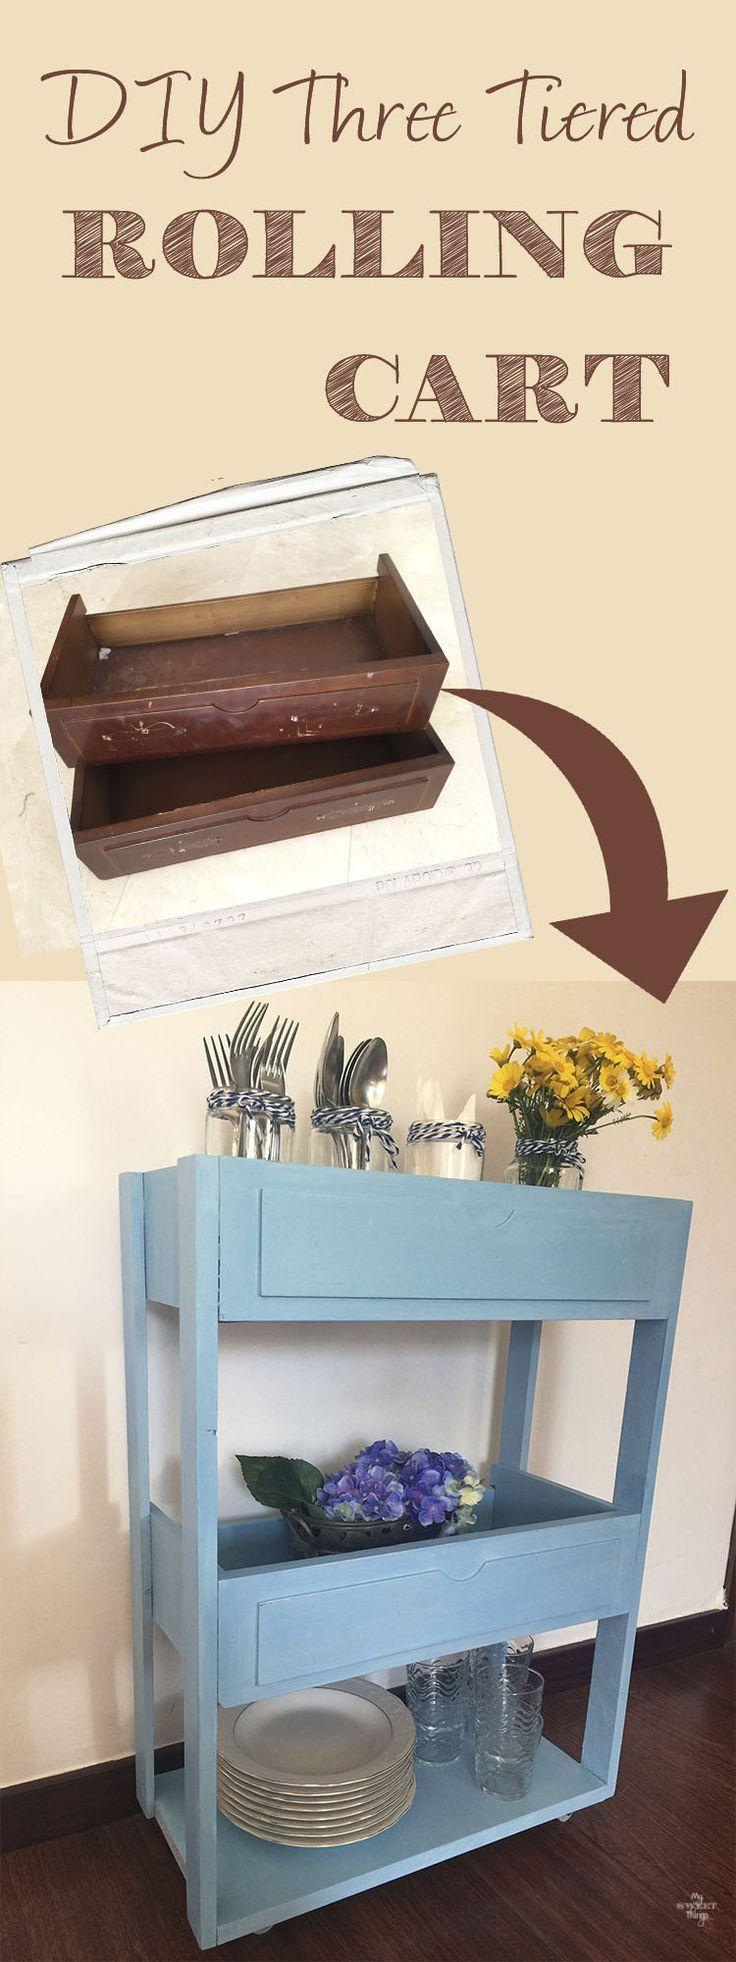 297 besten spontane fundst cke bilder auf pinterest. Black Bedroom Furniture Sets. Home Design Ideas